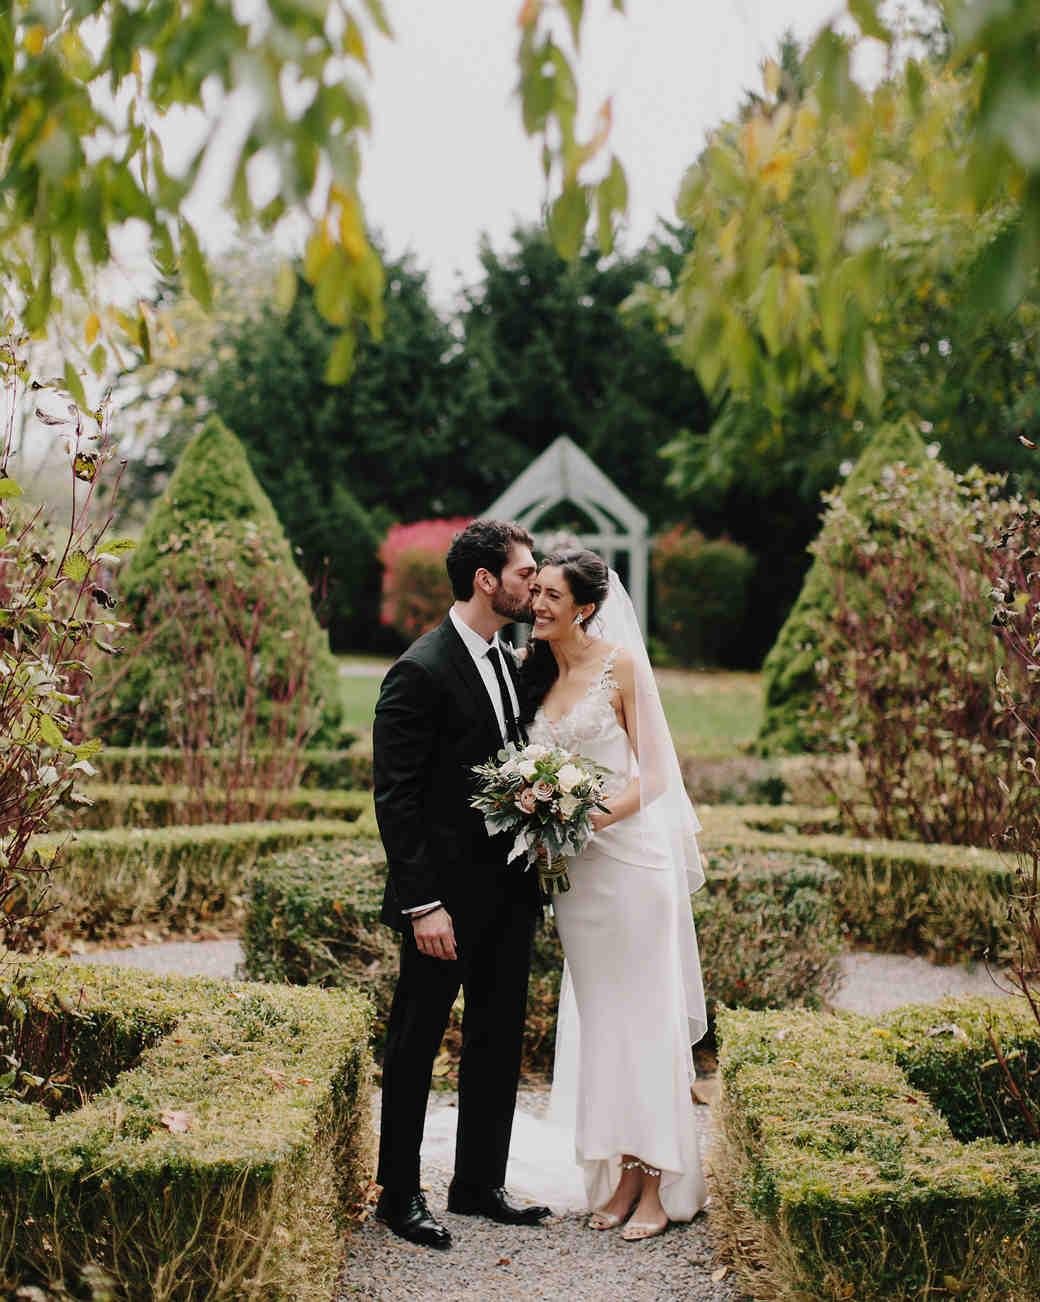 rosie-constantine-wedding-couple-295-s112177-1015.jpg